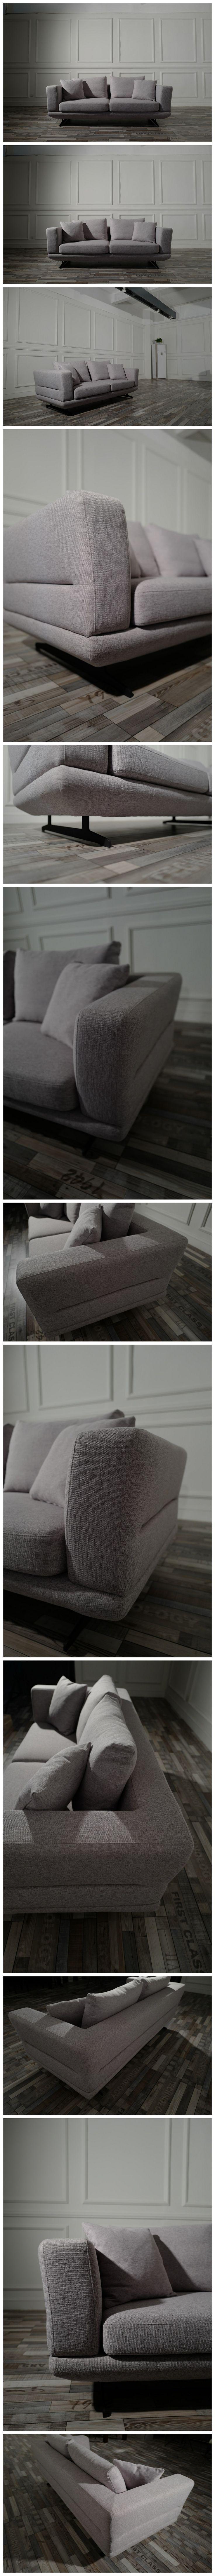 The 25 best Deep seated sofa ideas on Pinterest